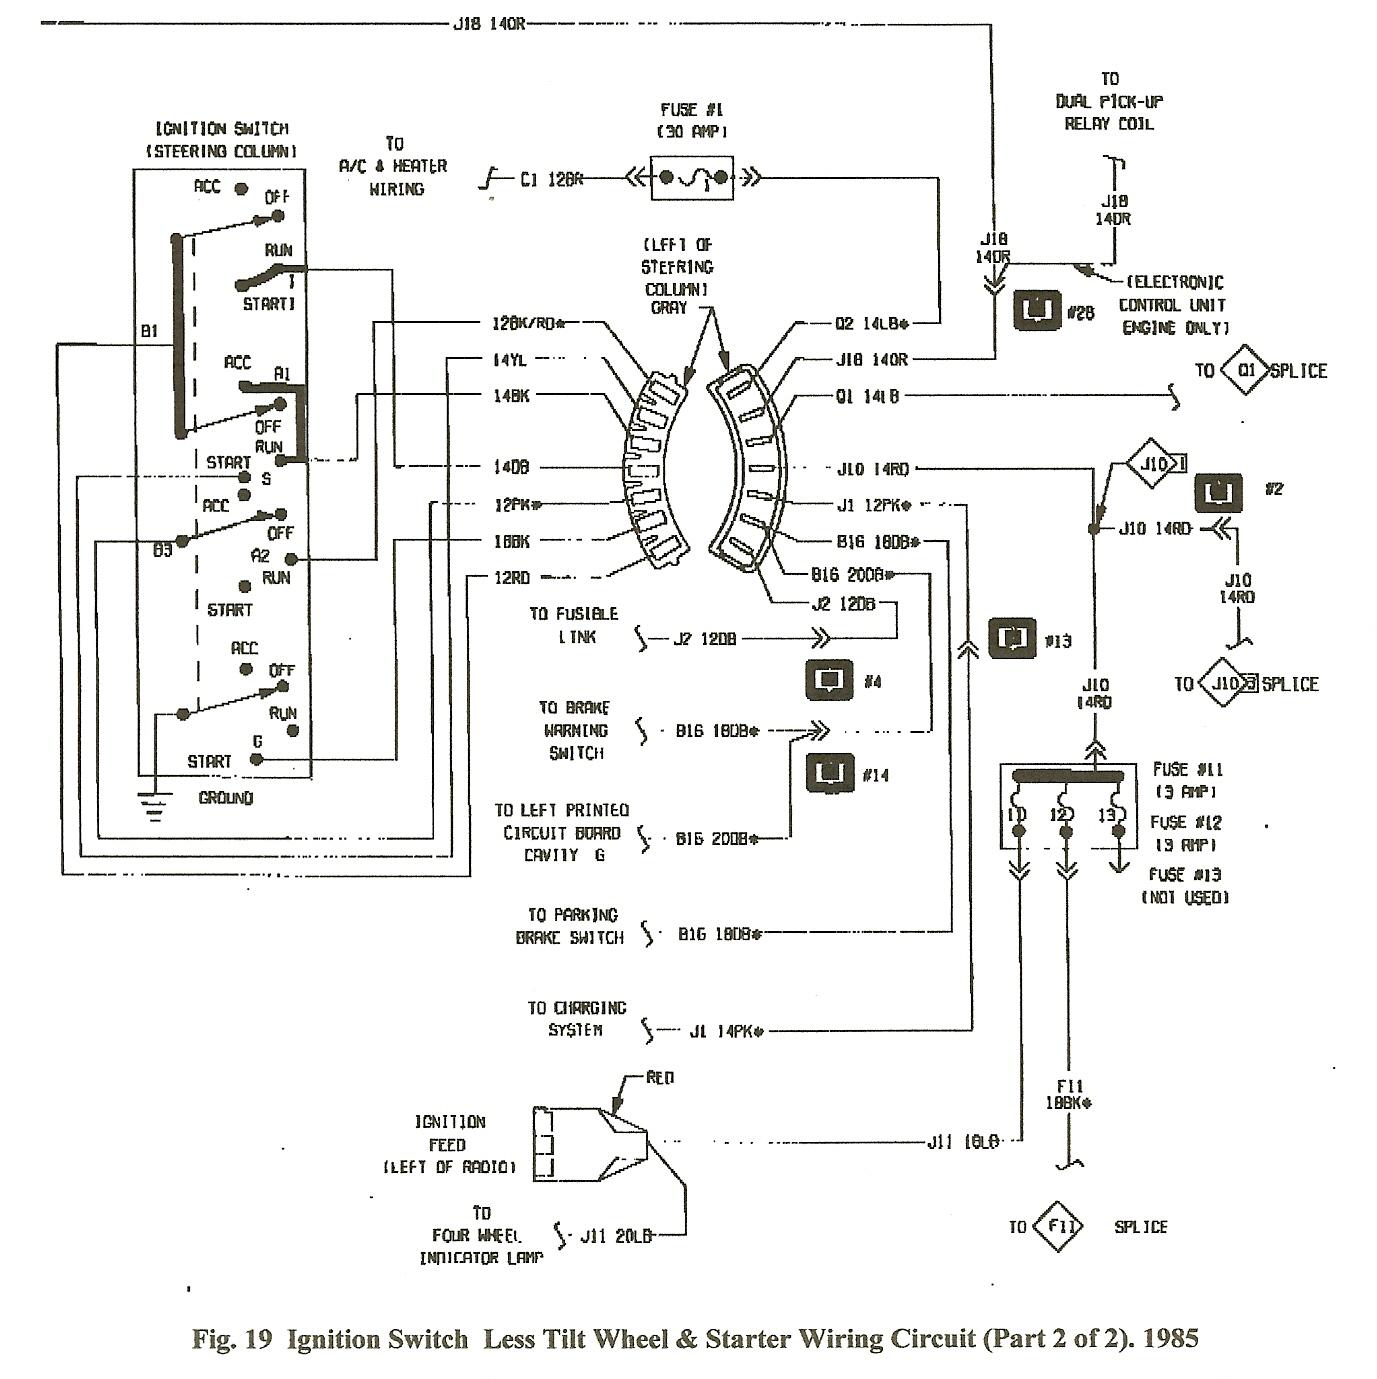 1987 Dodge Ram 150 Wiring Diagram   Manual E-Books - Dodge Ram Wiring Harness Diagram